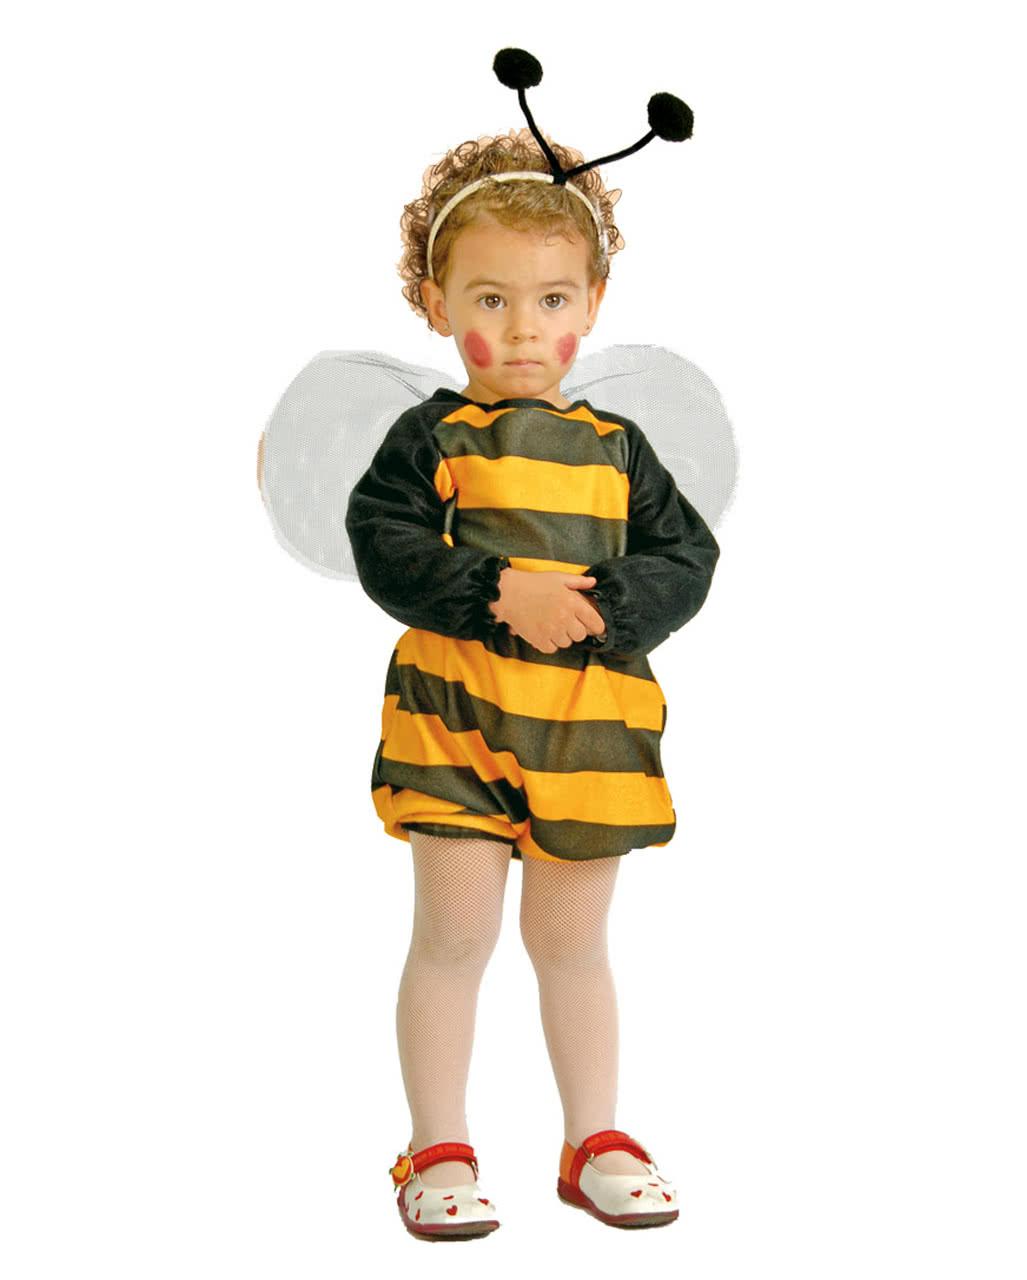 Bienchen Baby Kostum Fur Fasching Horror Shop Com